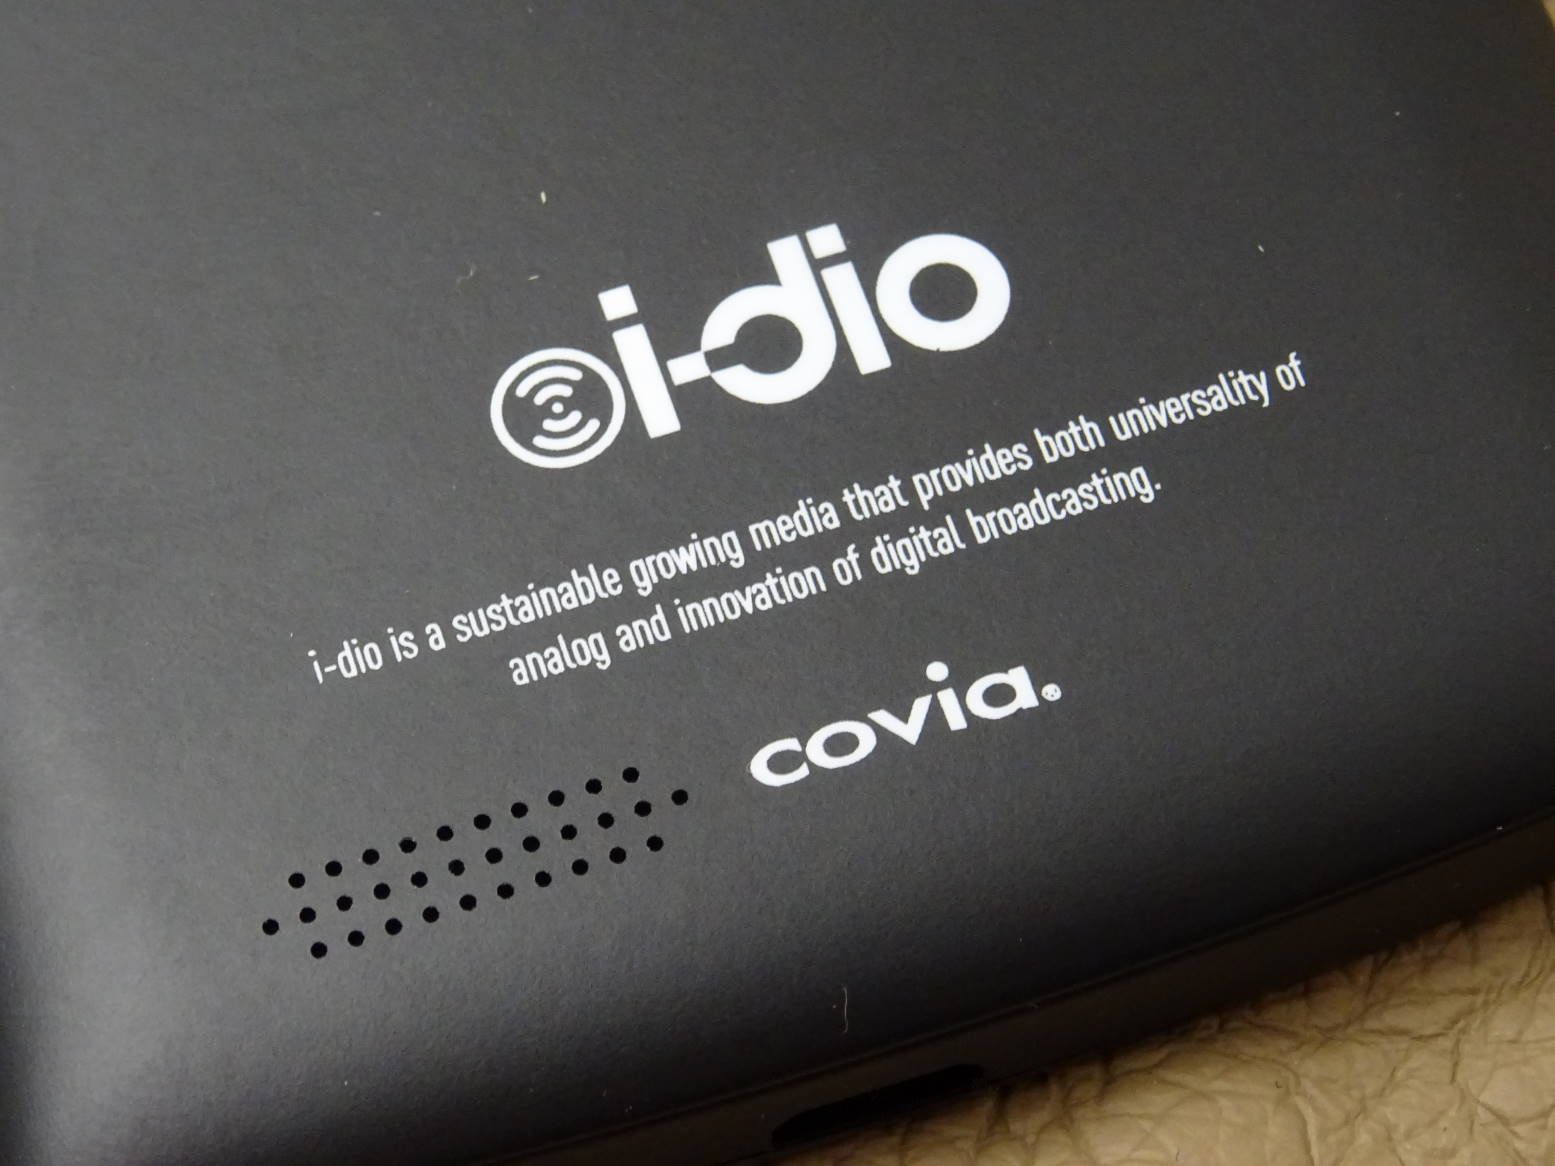 covia i-dio Phone CP-VL5A 背面ロゴ